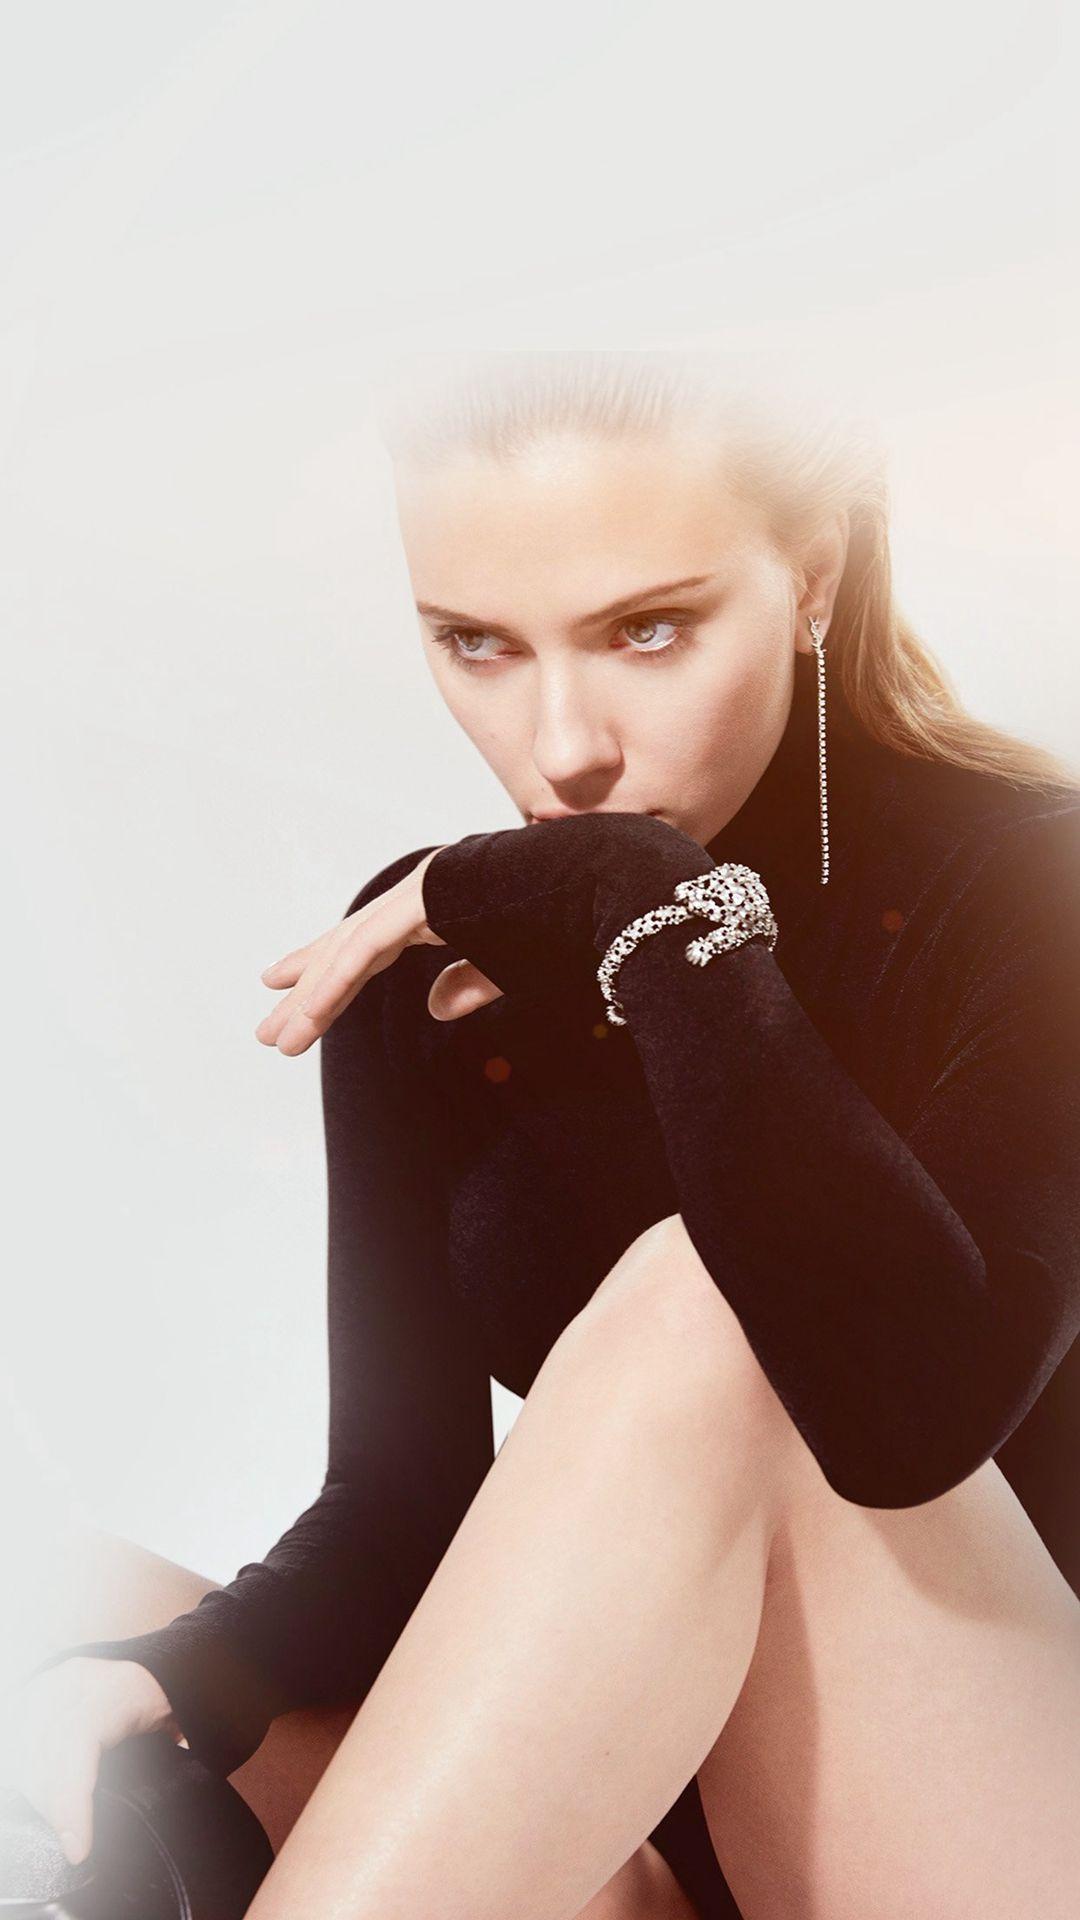 Model Celebrity Scarlett Johansson Actress IPhone 6 Wallpaper